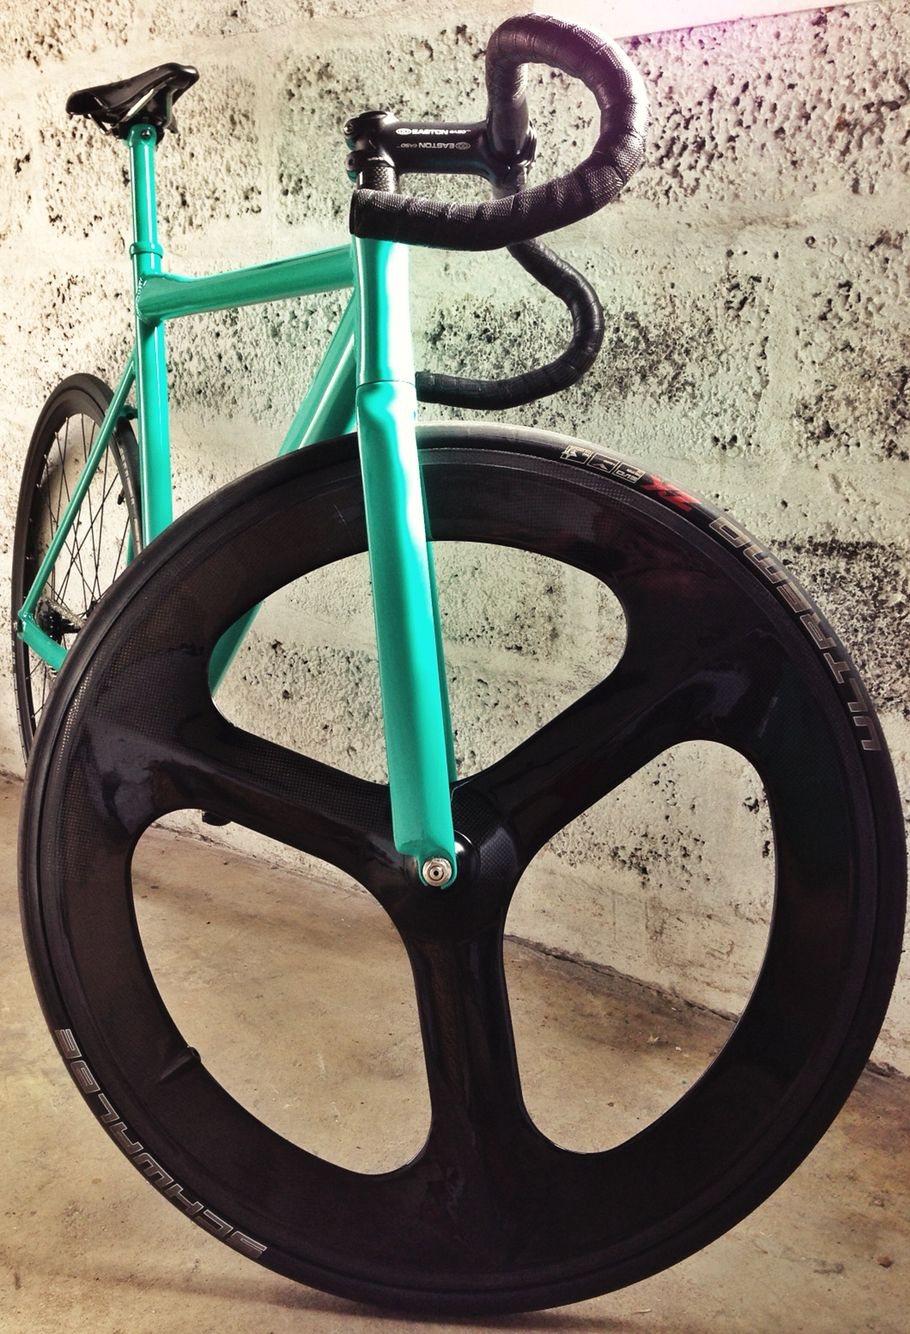 Felt TK-3 fixed gear bike